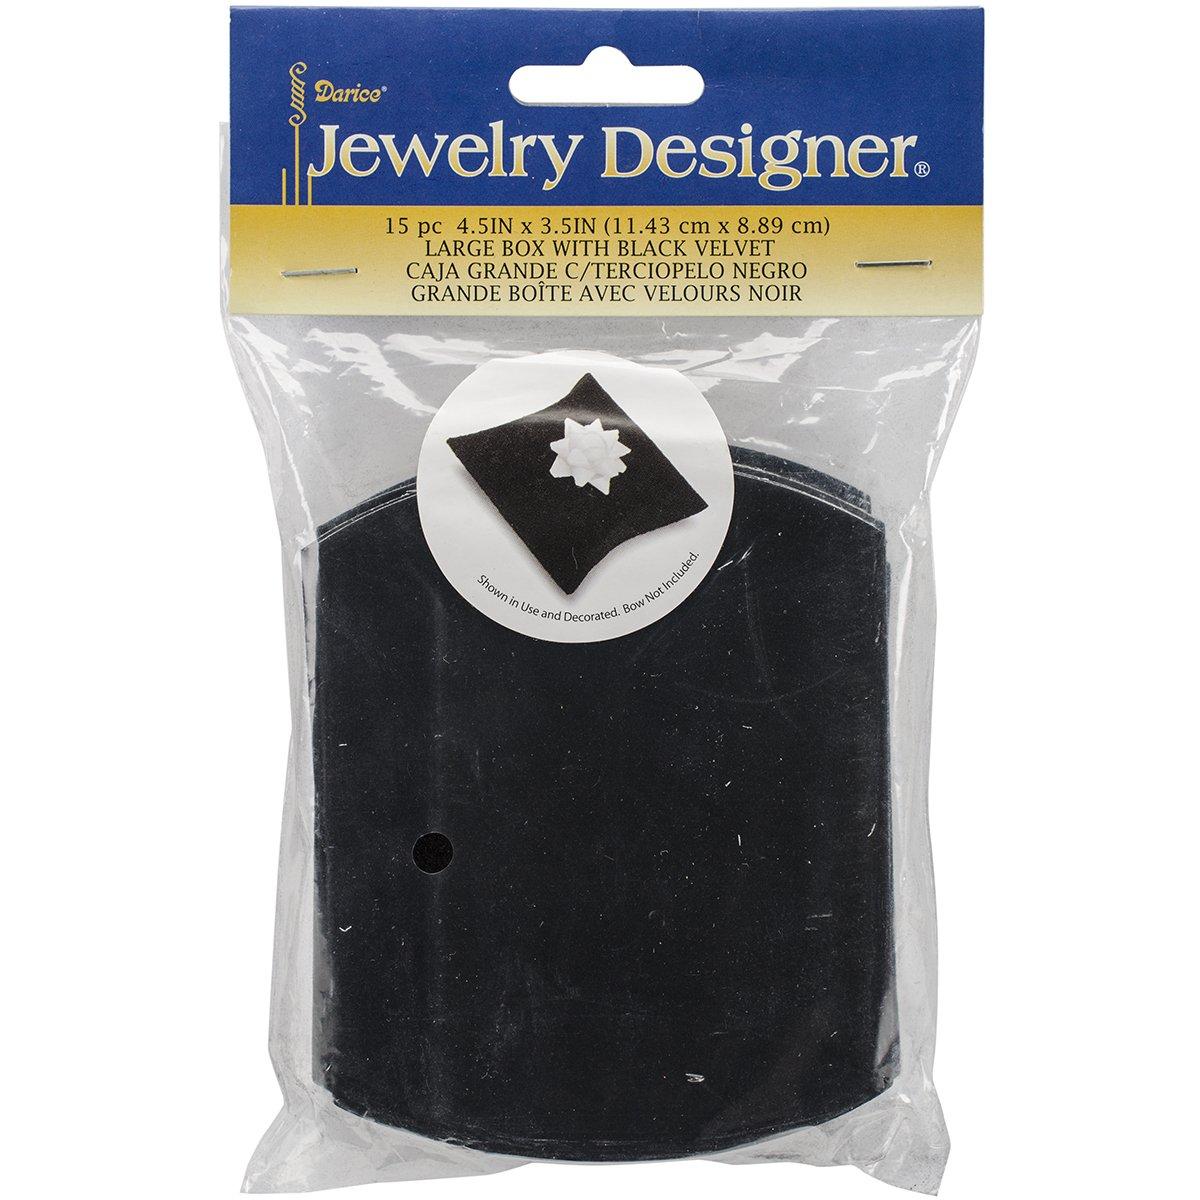 Darice Self Folding Jewelry Boxes (15 Pack), 4.5 x 3.5, Black Velvet 4.5 x 3.5 1893-32